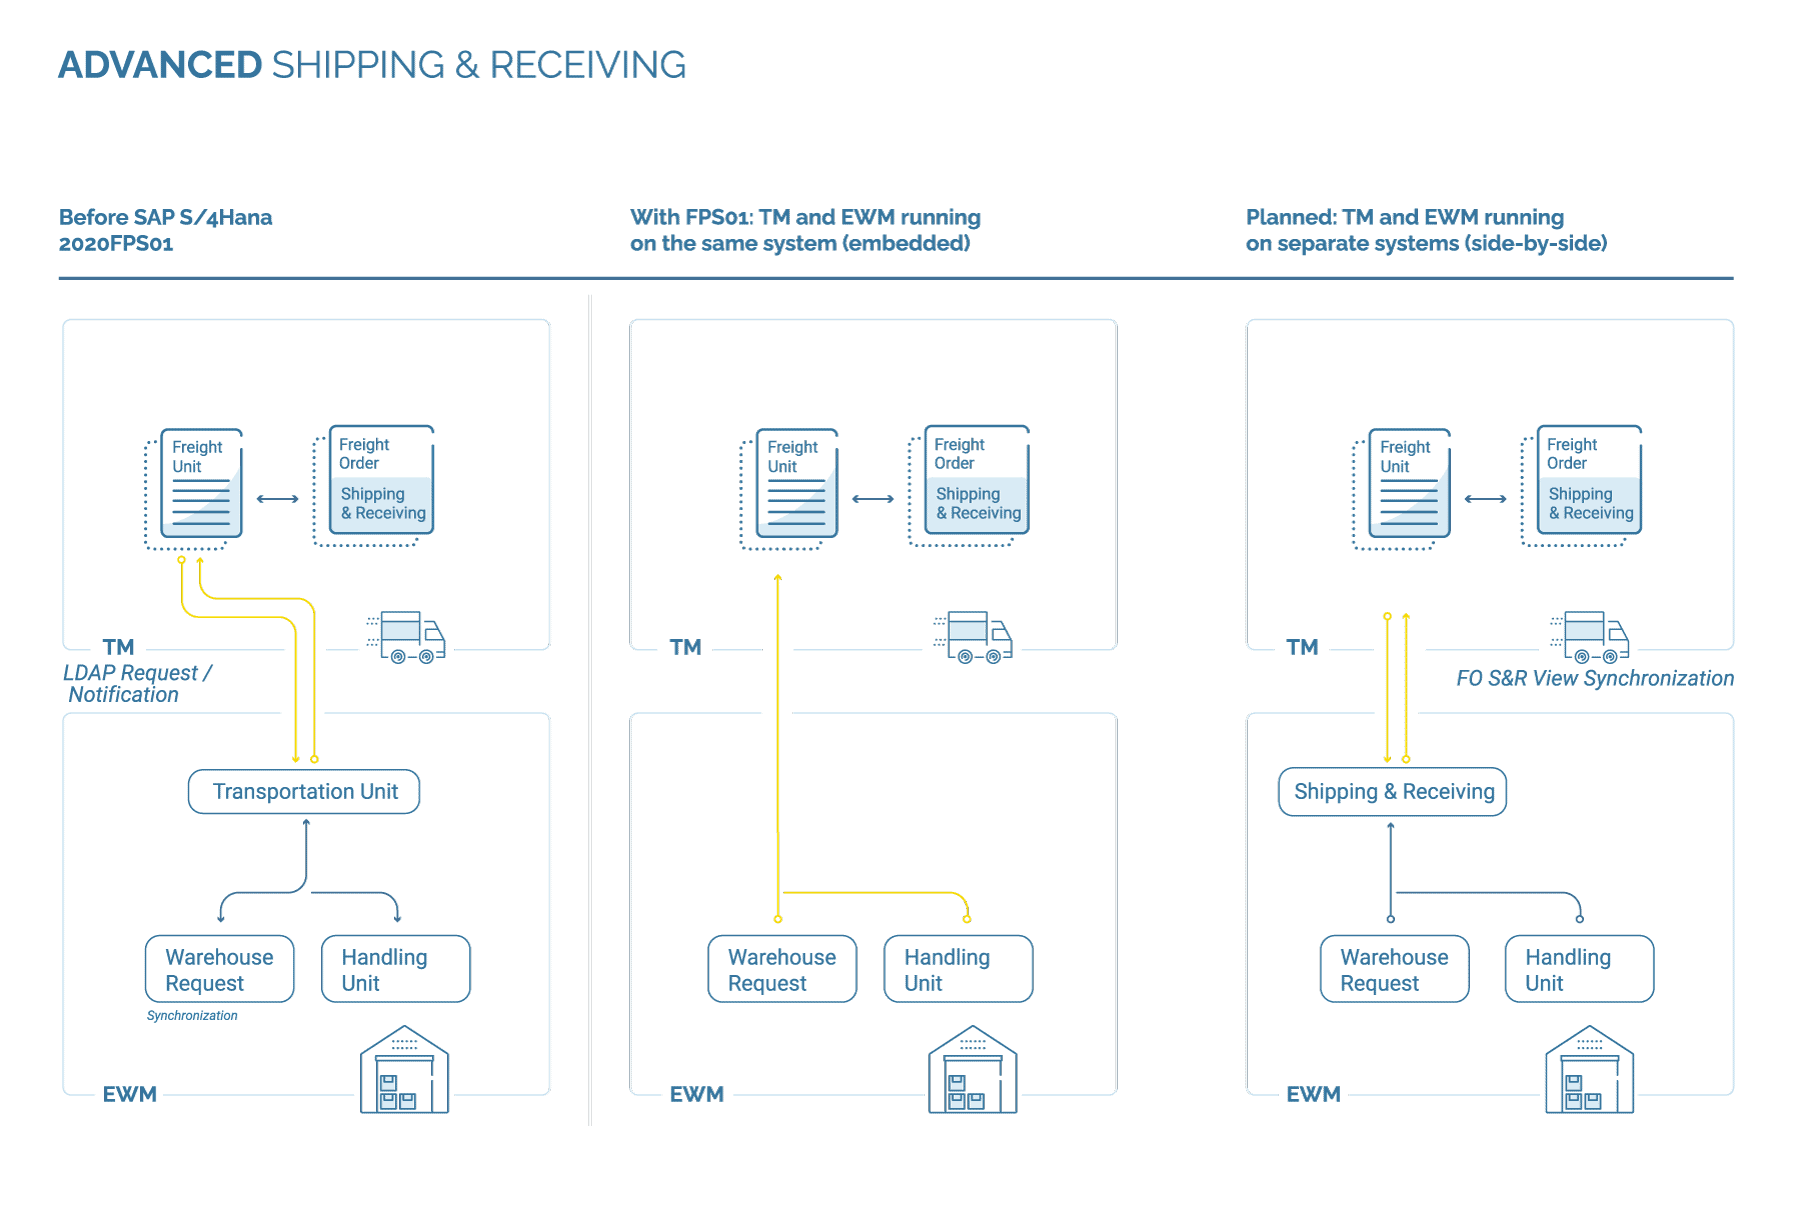 Grafische Darstellung Advanced Shipping & Receiving